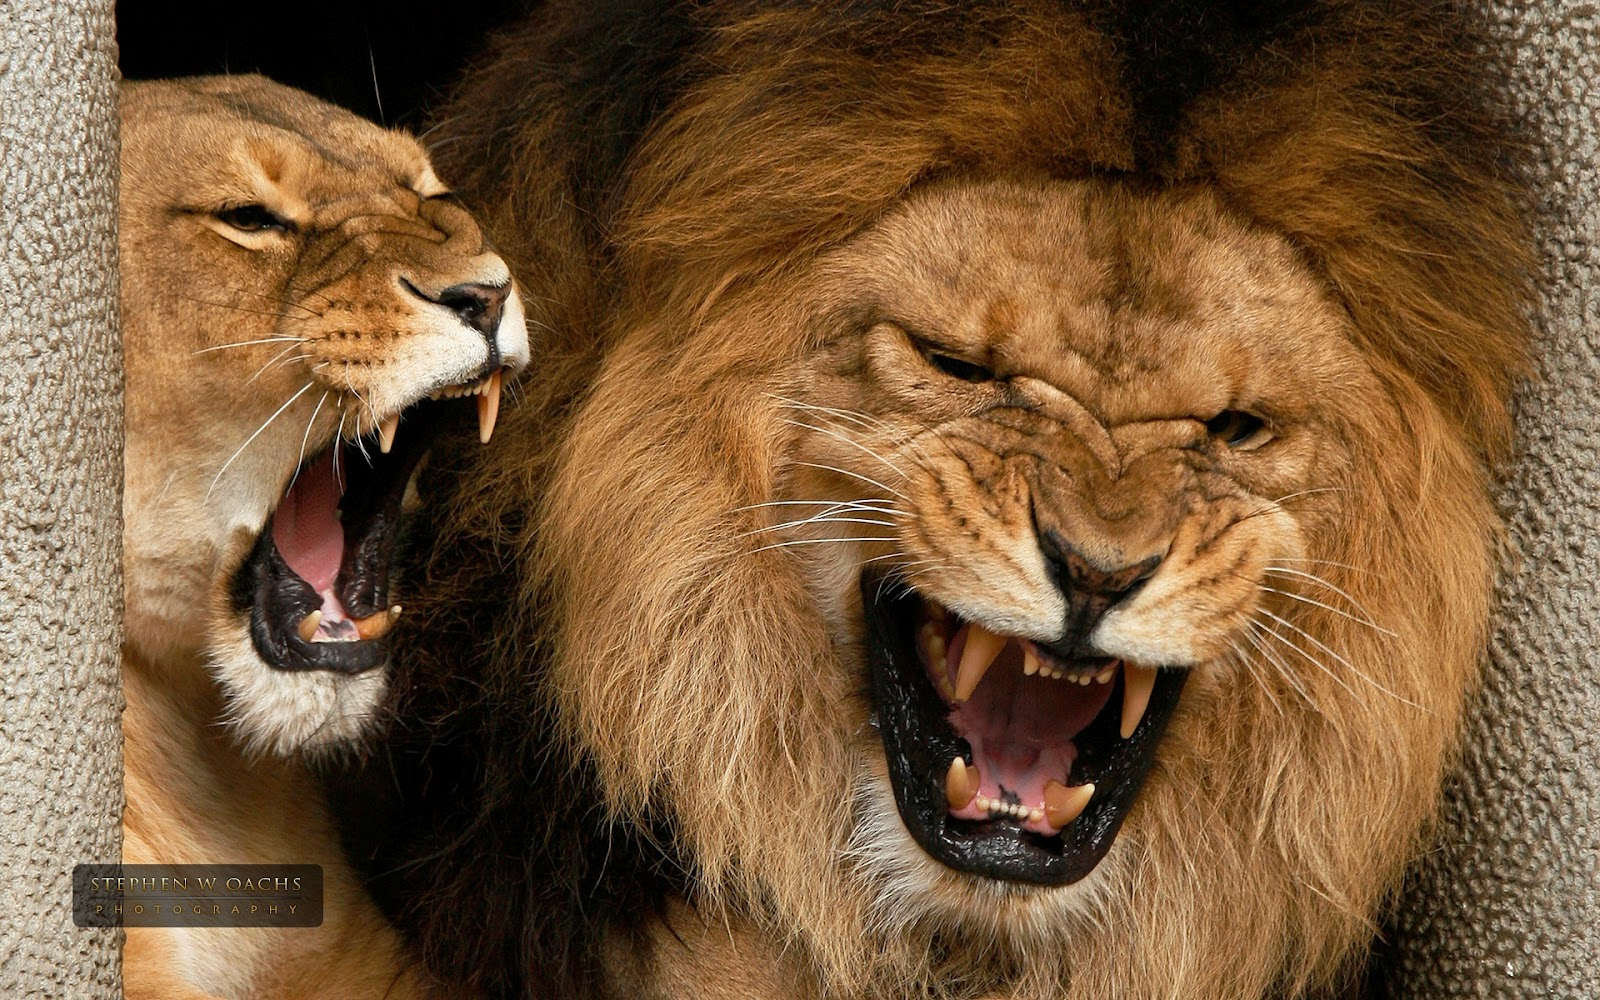 Lion pictures wallpaper - photo#53